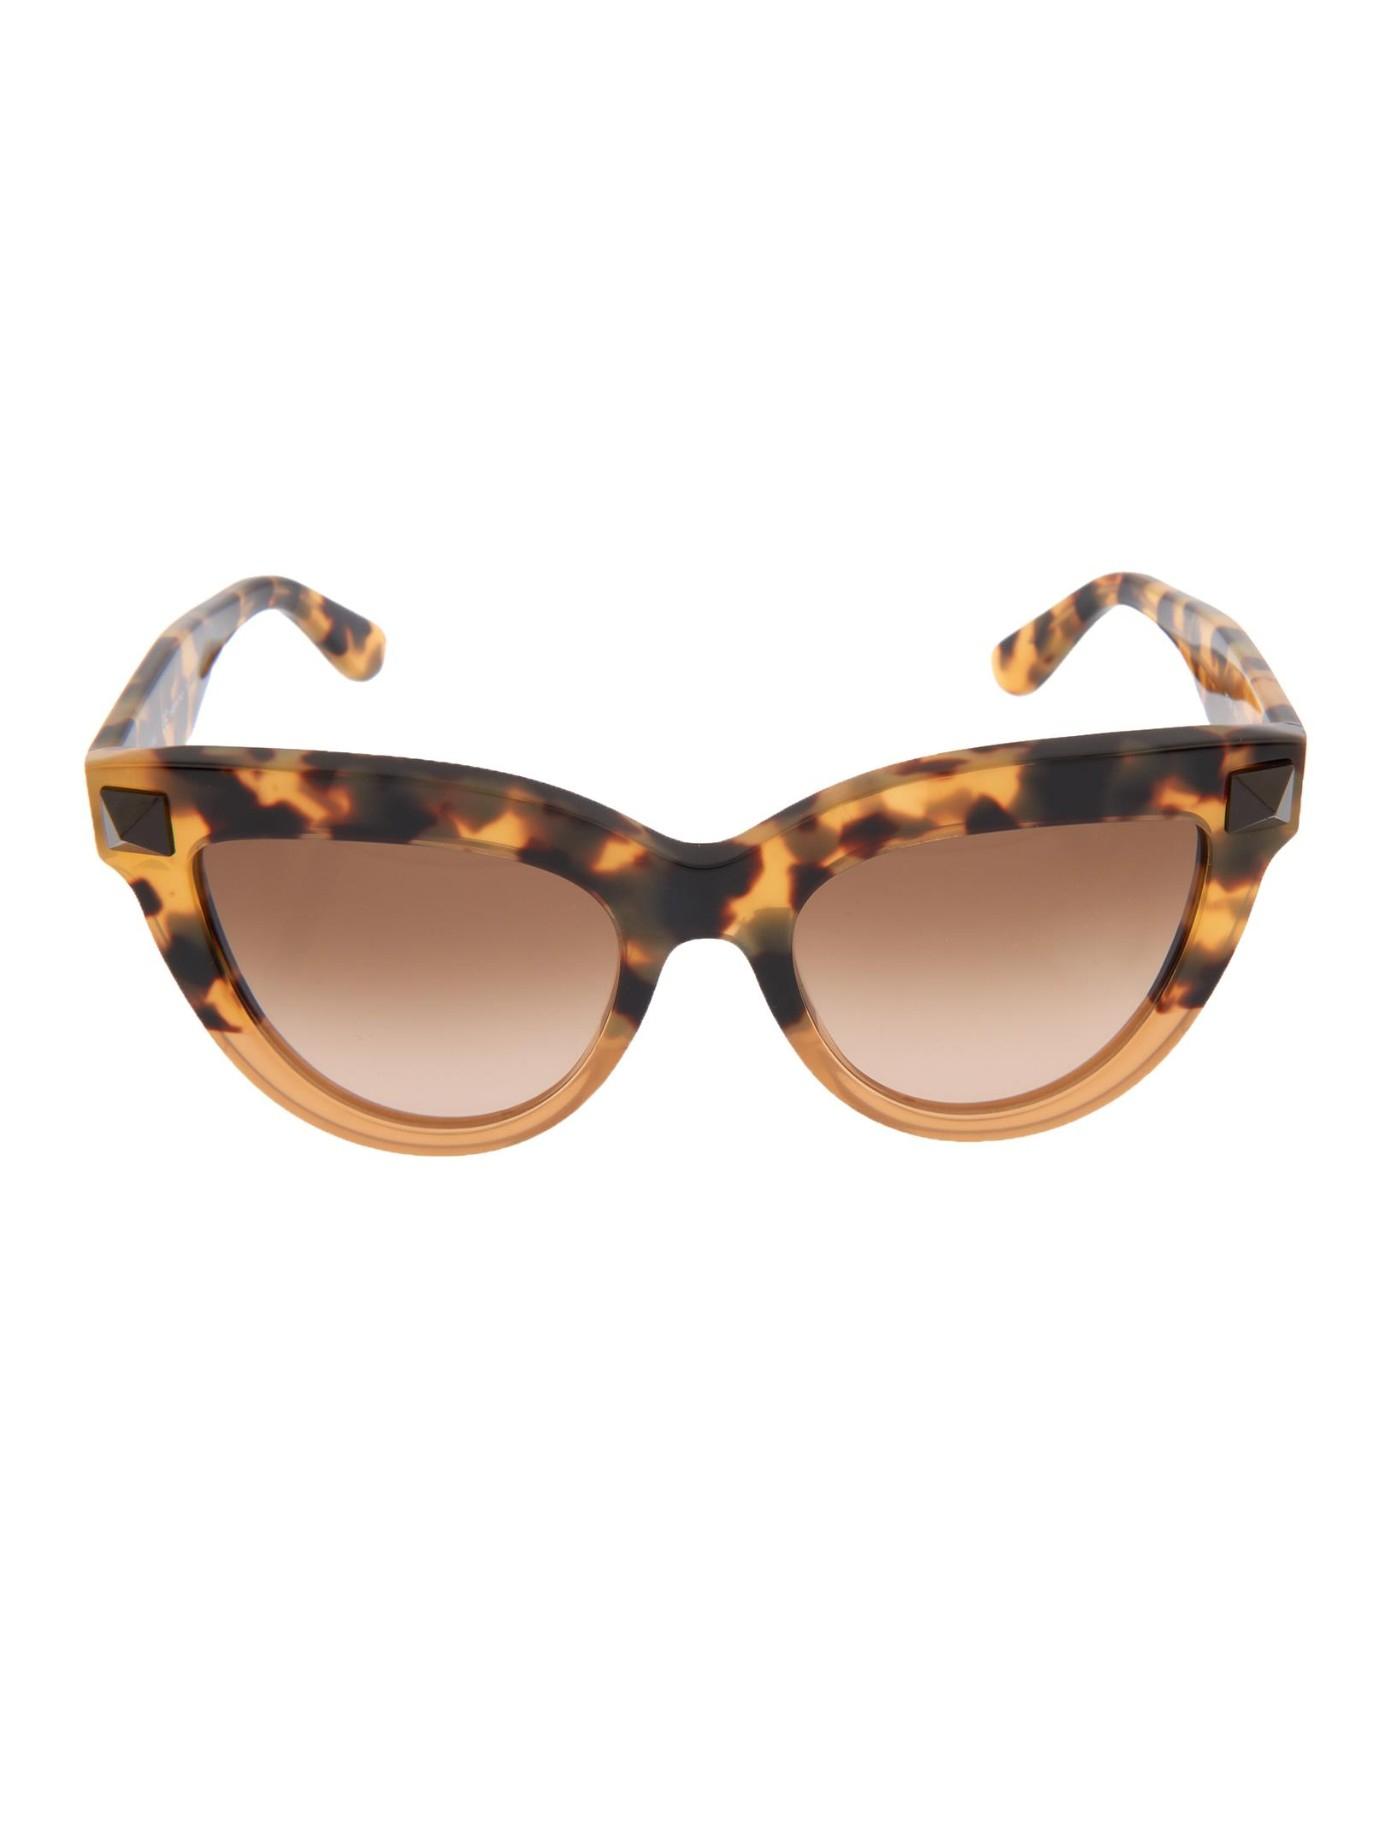 Valentino Cat-Eye Frame Sunglasses in Brown Lyst